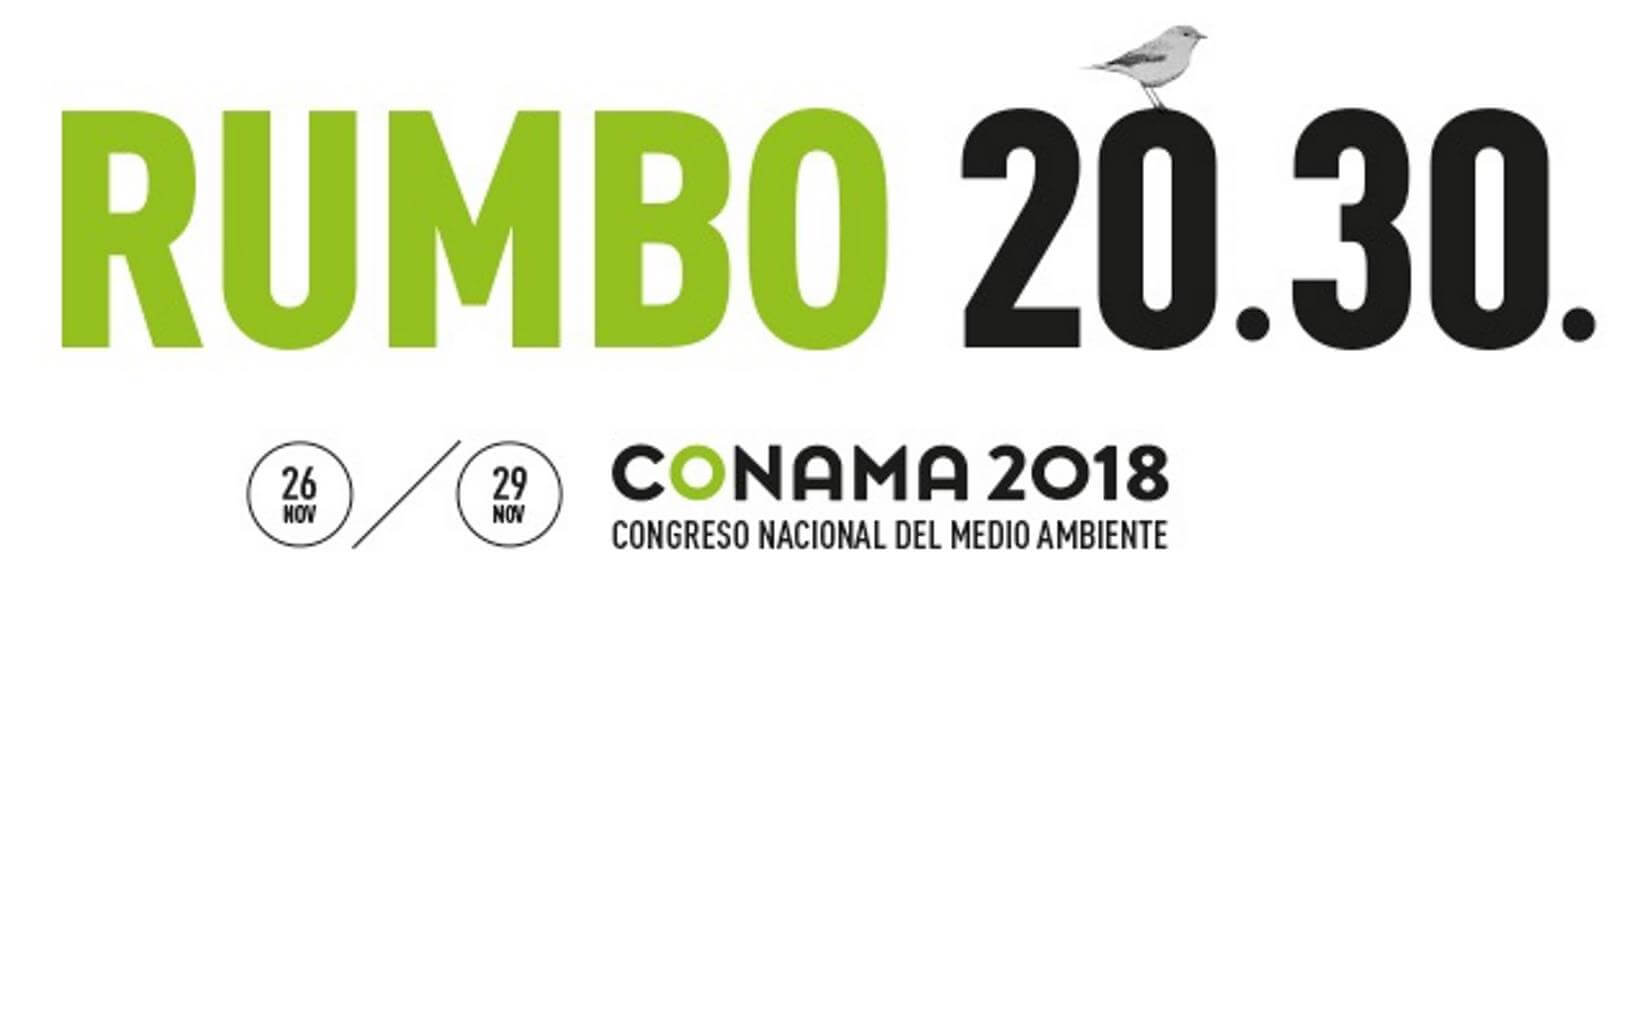 Hoop en CONAMA Rumbo 2030